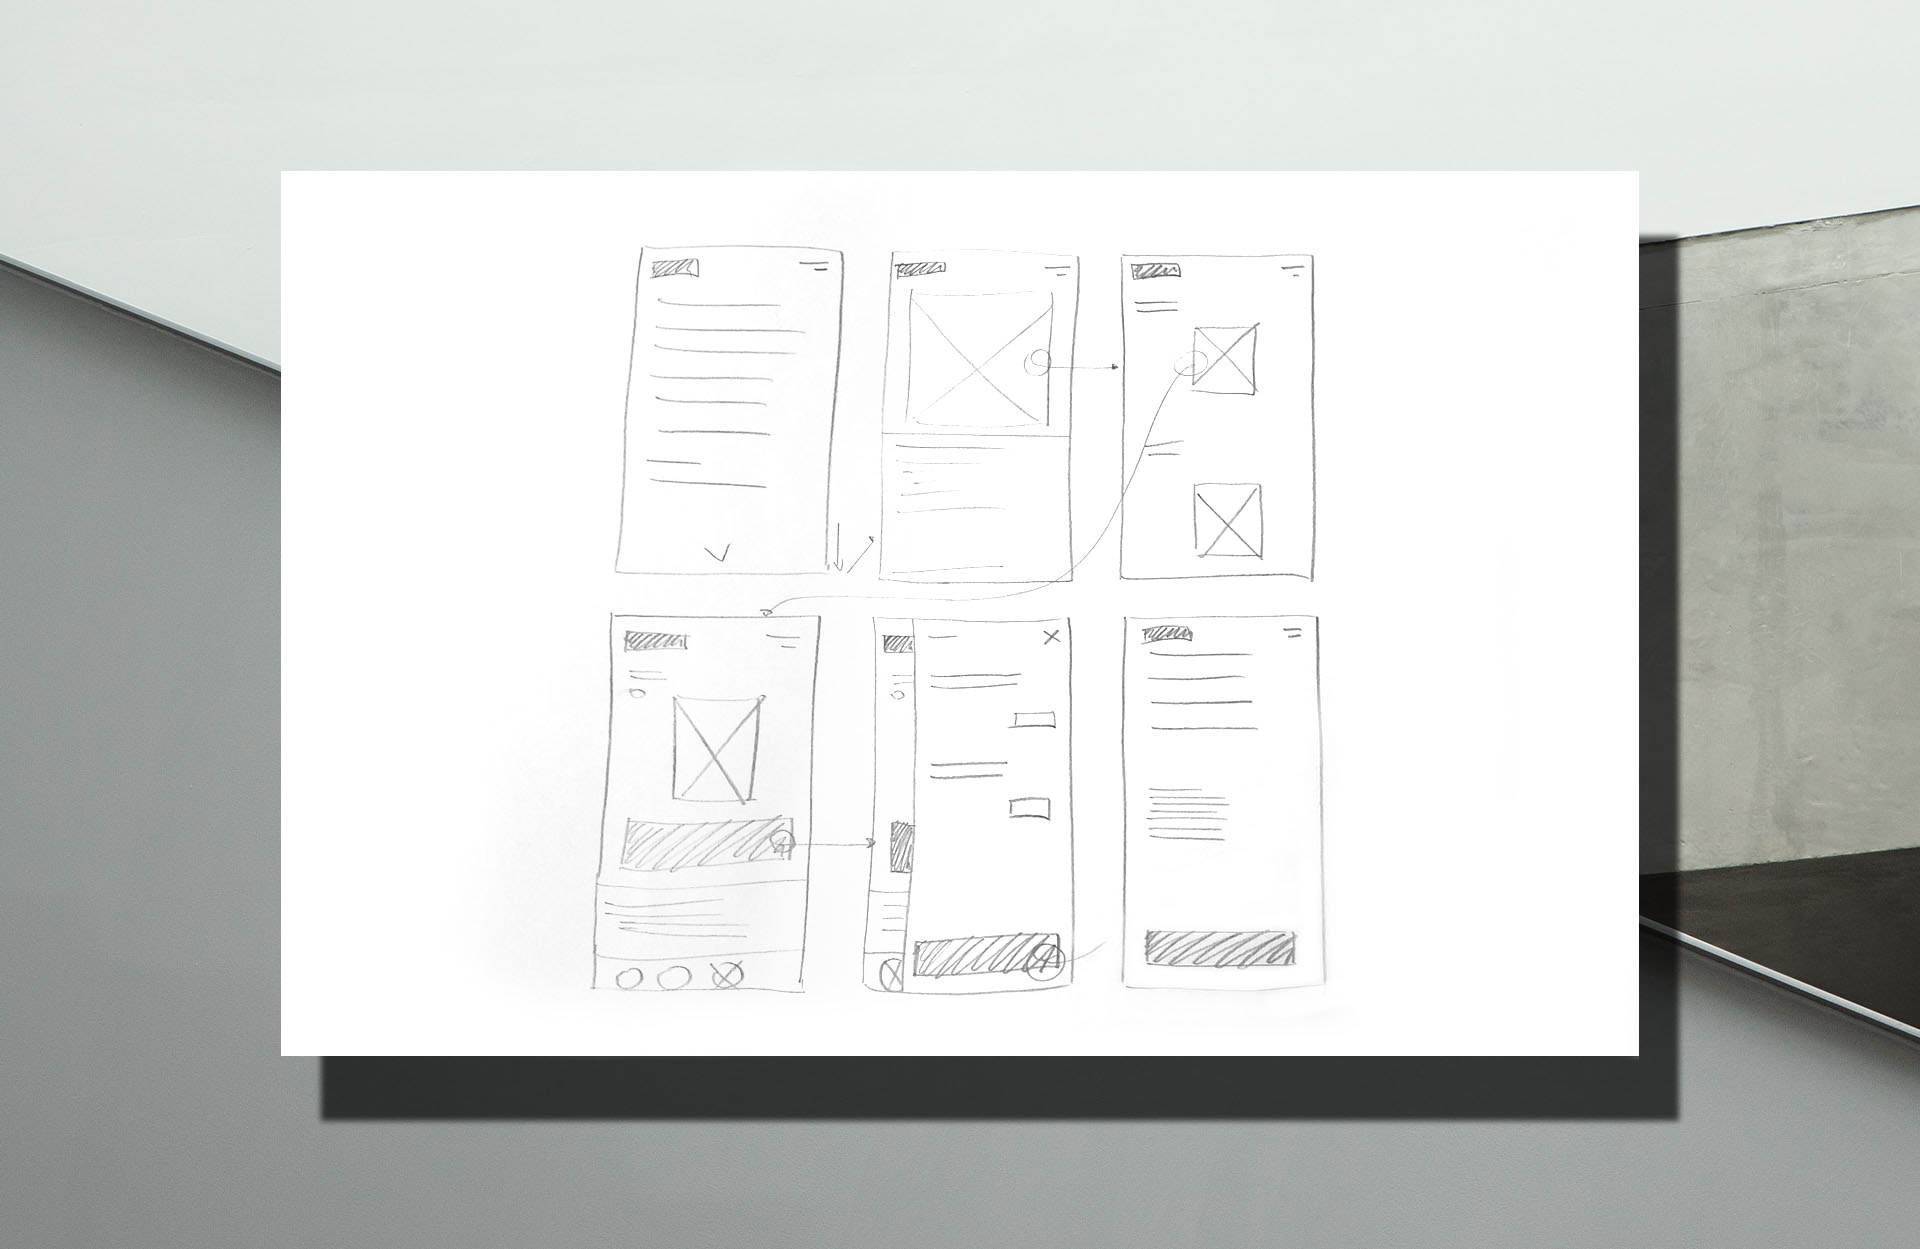 Discovery_sketchesArtboard-1-copy-2